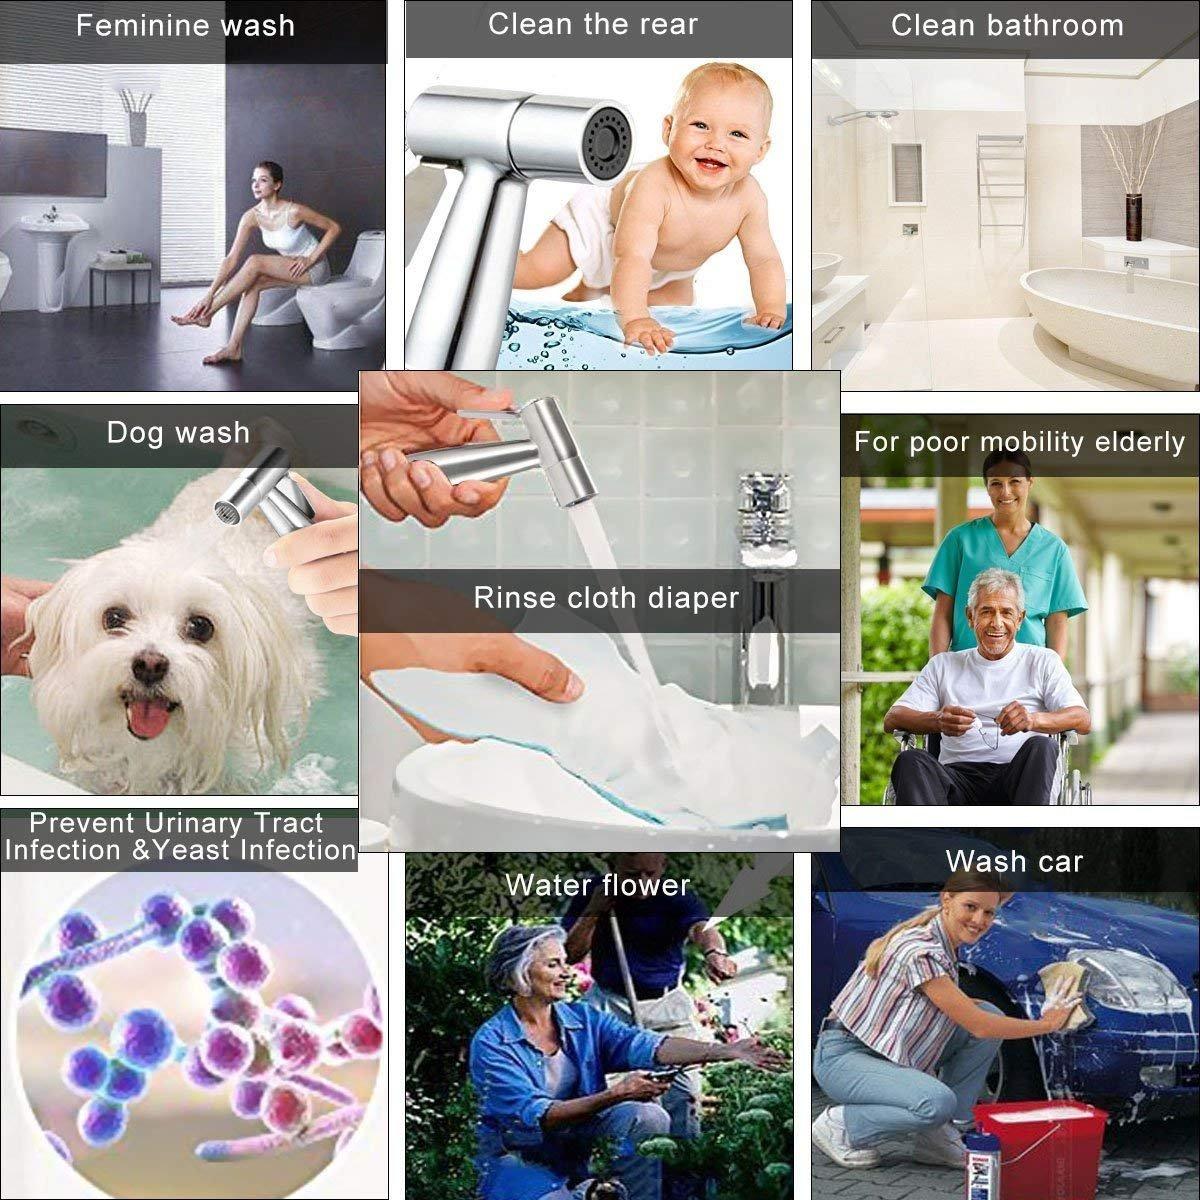 Bidet Spayer, Hiseea Handheld Bidet Toilet Spray for Personal Hygiene, Pet Bath, Closestool, Squatting Pan, Water Flower, Floor Cleaning with Spray Holder, T-Valve, 1.2M Stainless Hose, 1.5M Telfon